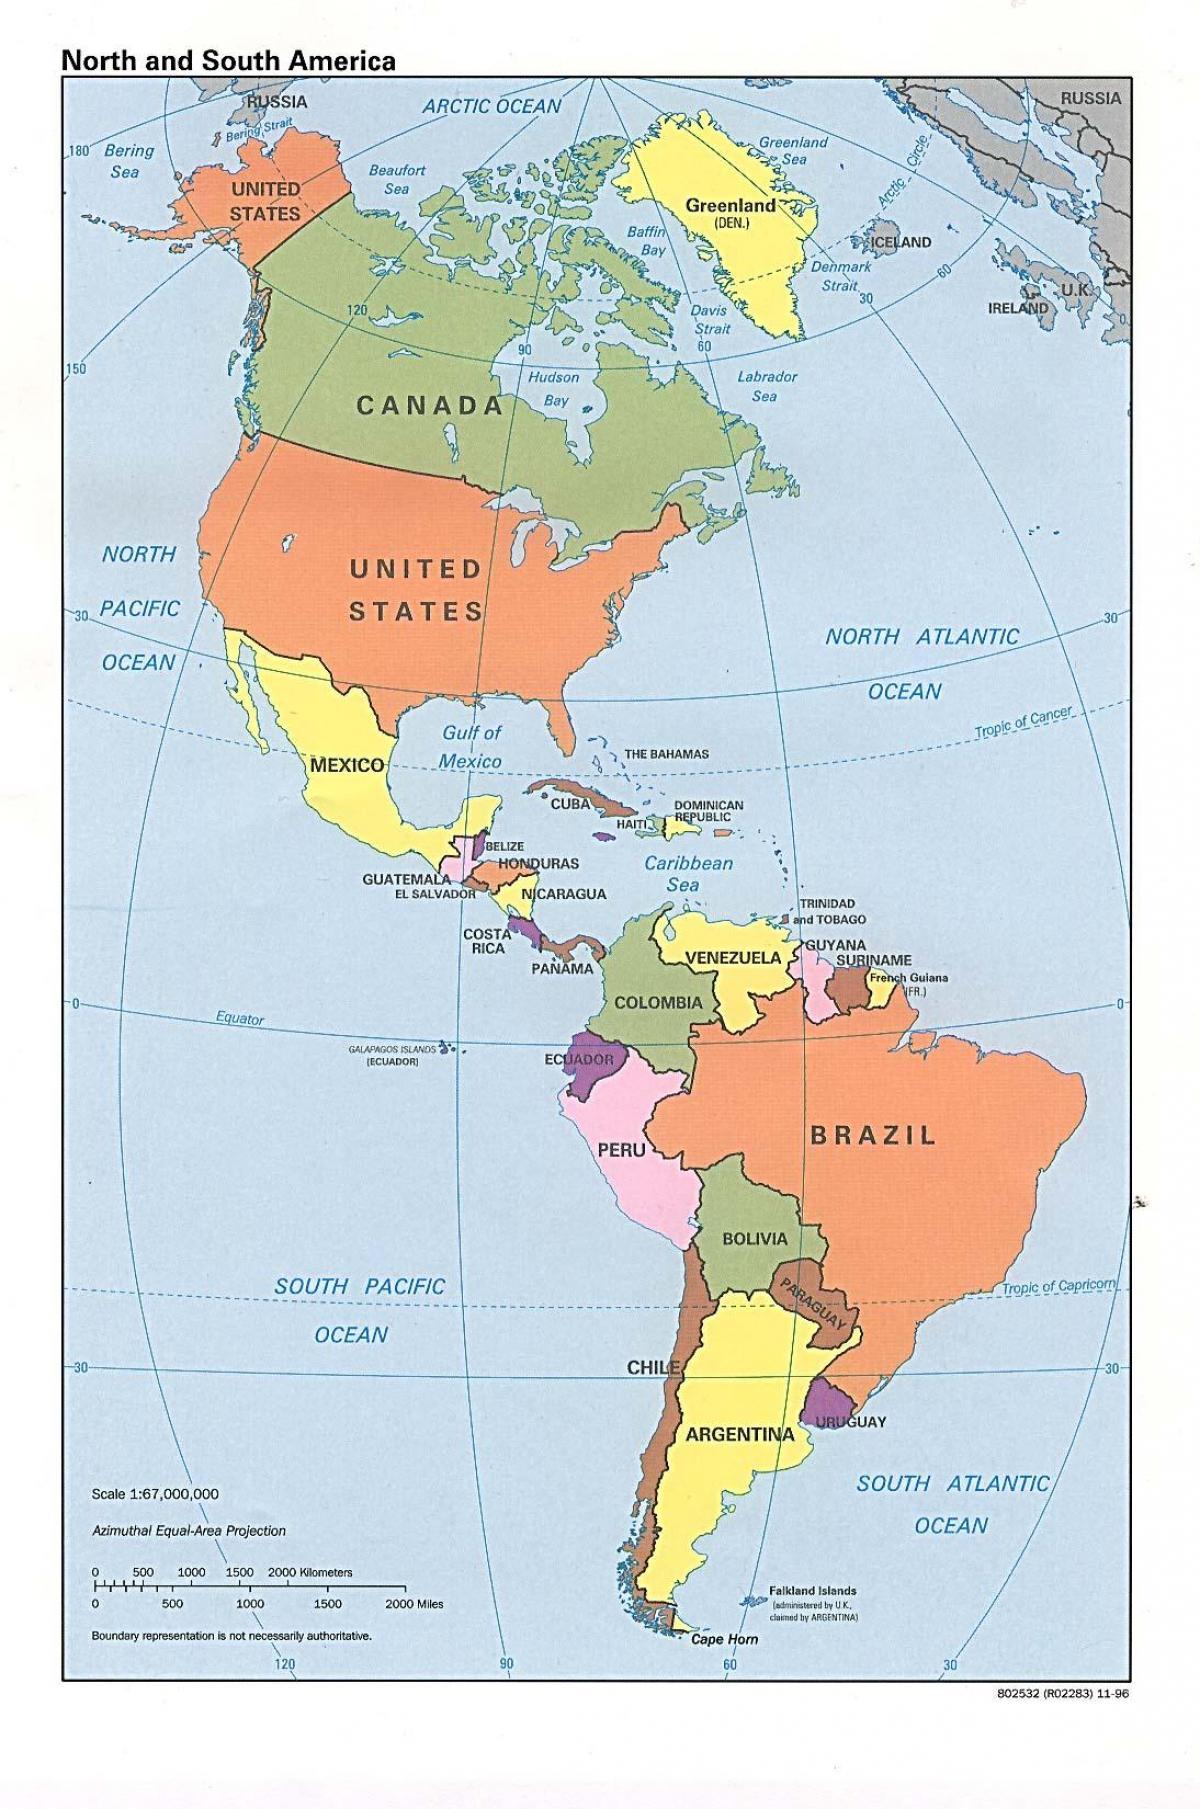 nord amerika kart Kart over Canada med hav   Canada kart hav (Nord Amerika   Amerika) nord amerika kart